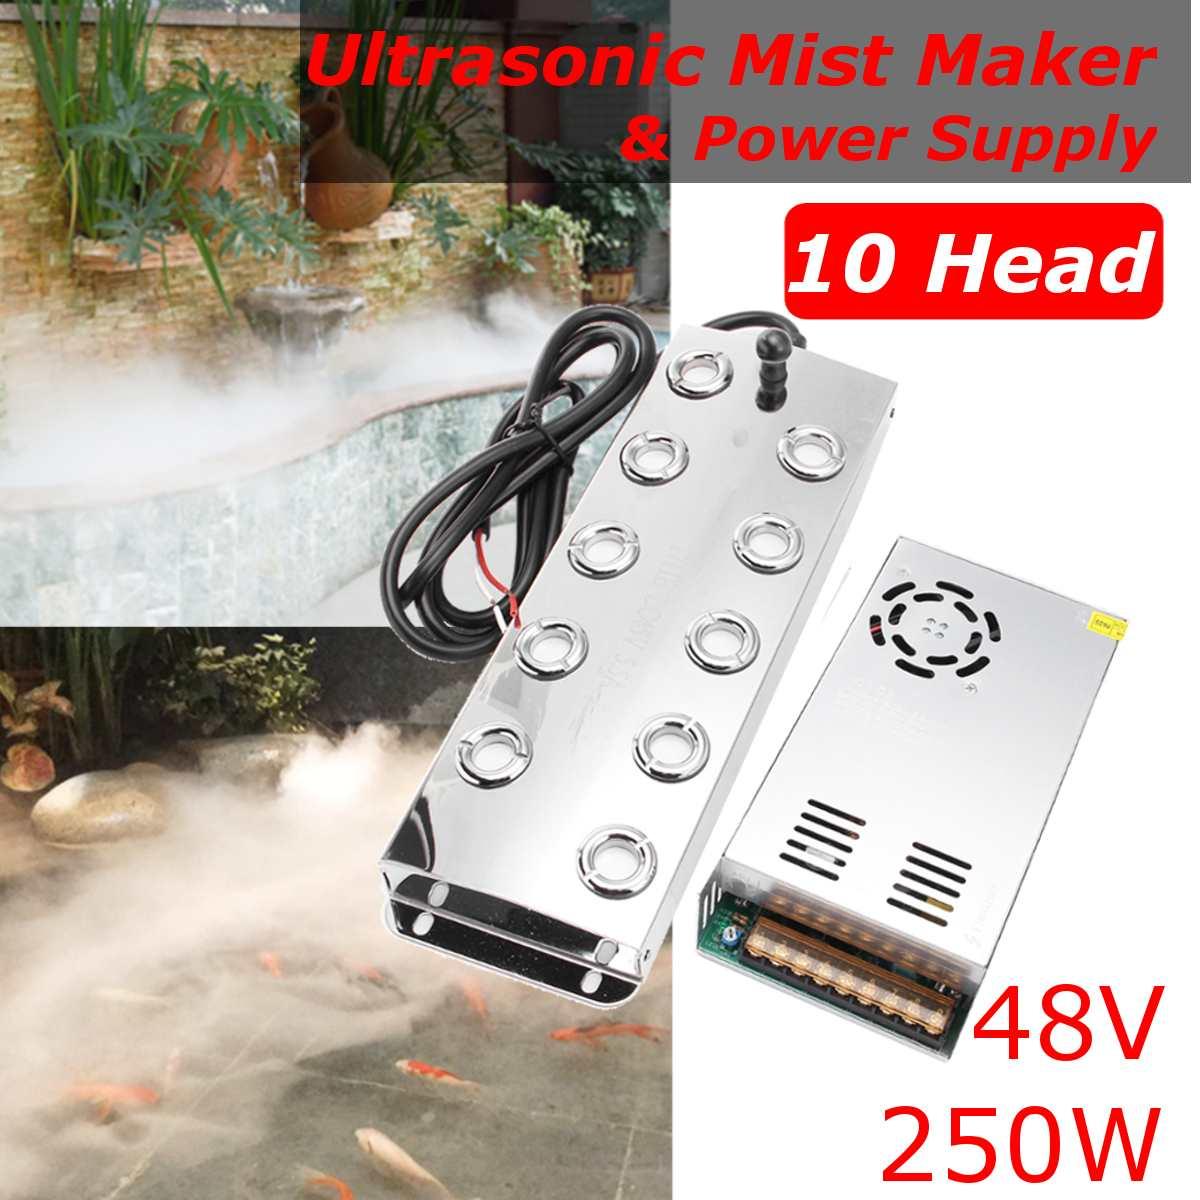 Newest 10 Head 5000ML/H Ultrasonic Mist Maker Fogger Stainless Steel Air Humidifier Greenhouse Aeromist Hydroponics+Transformer